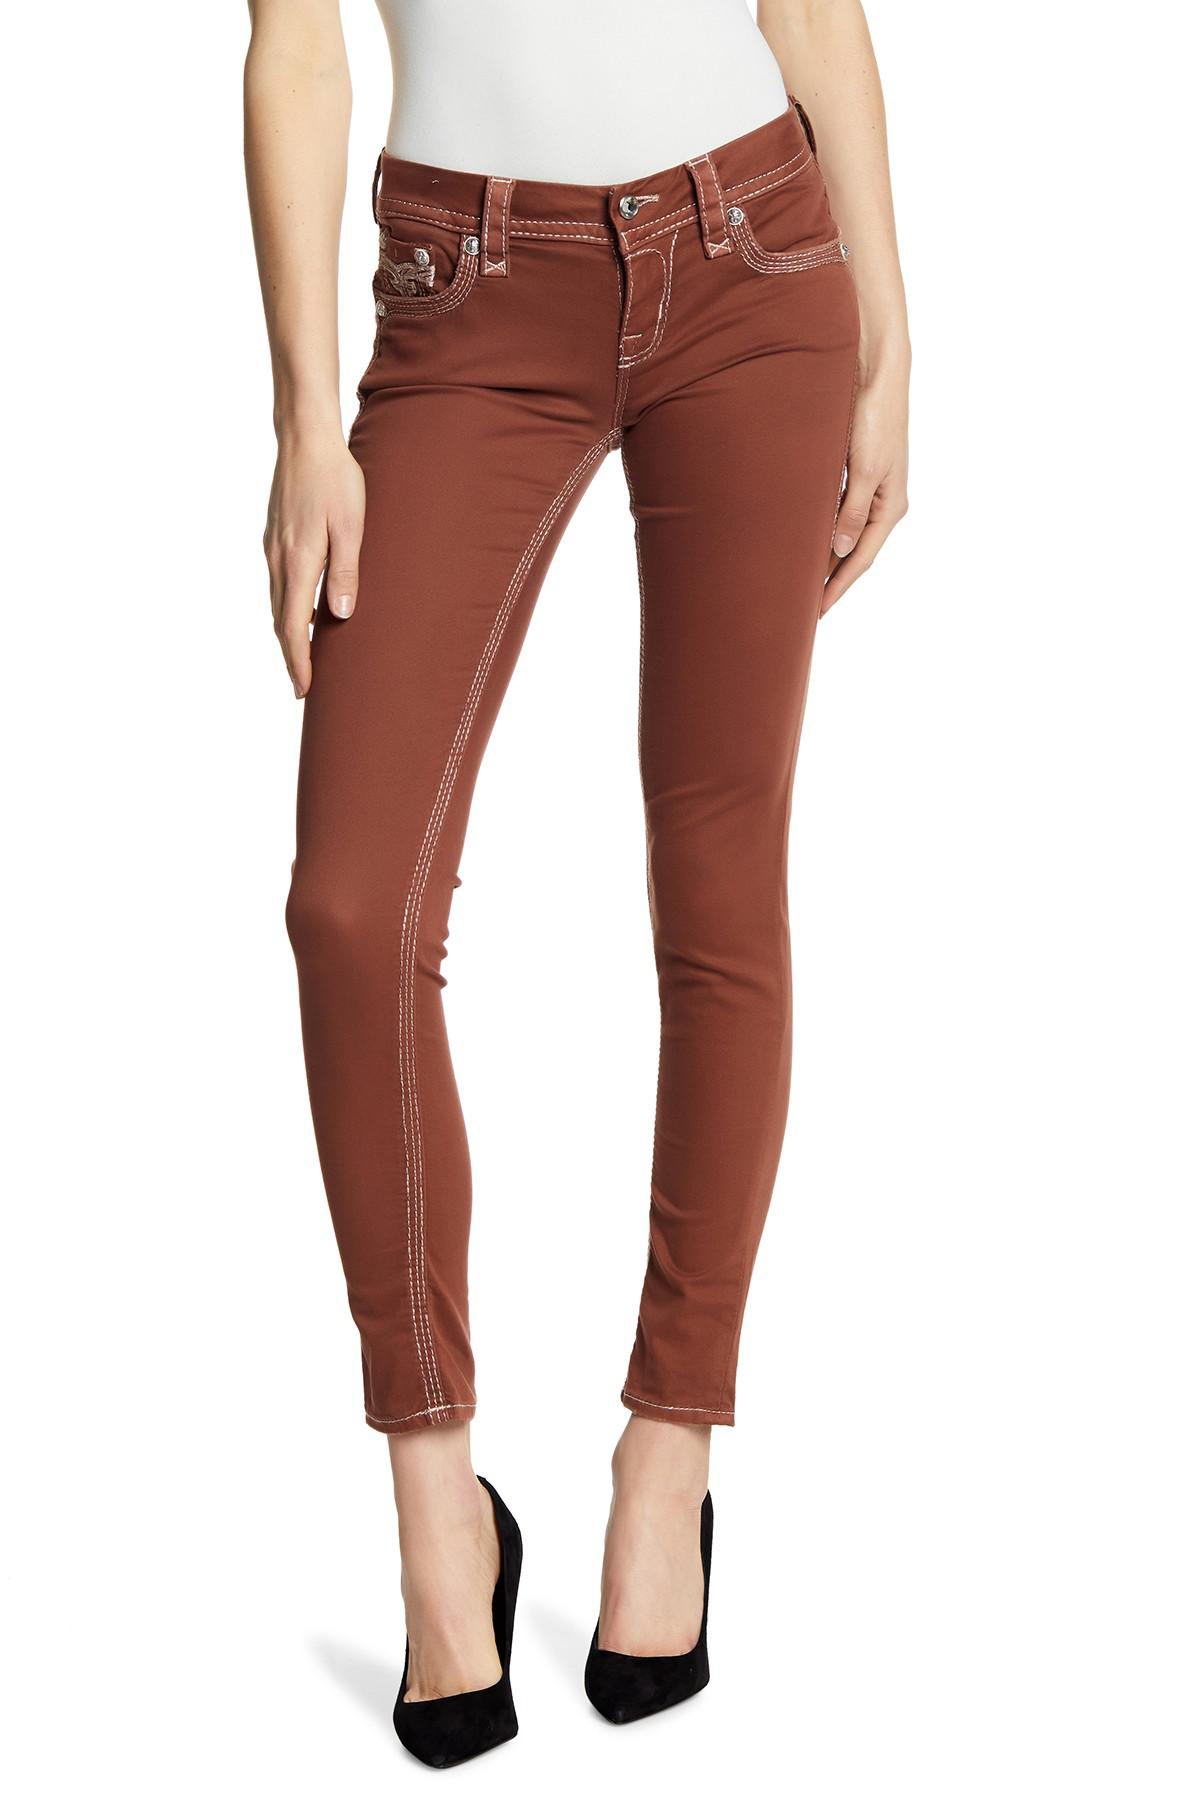 984b576a02 Lyst - Rock Revival Roselle Metallic Stitch Skinny Jeans